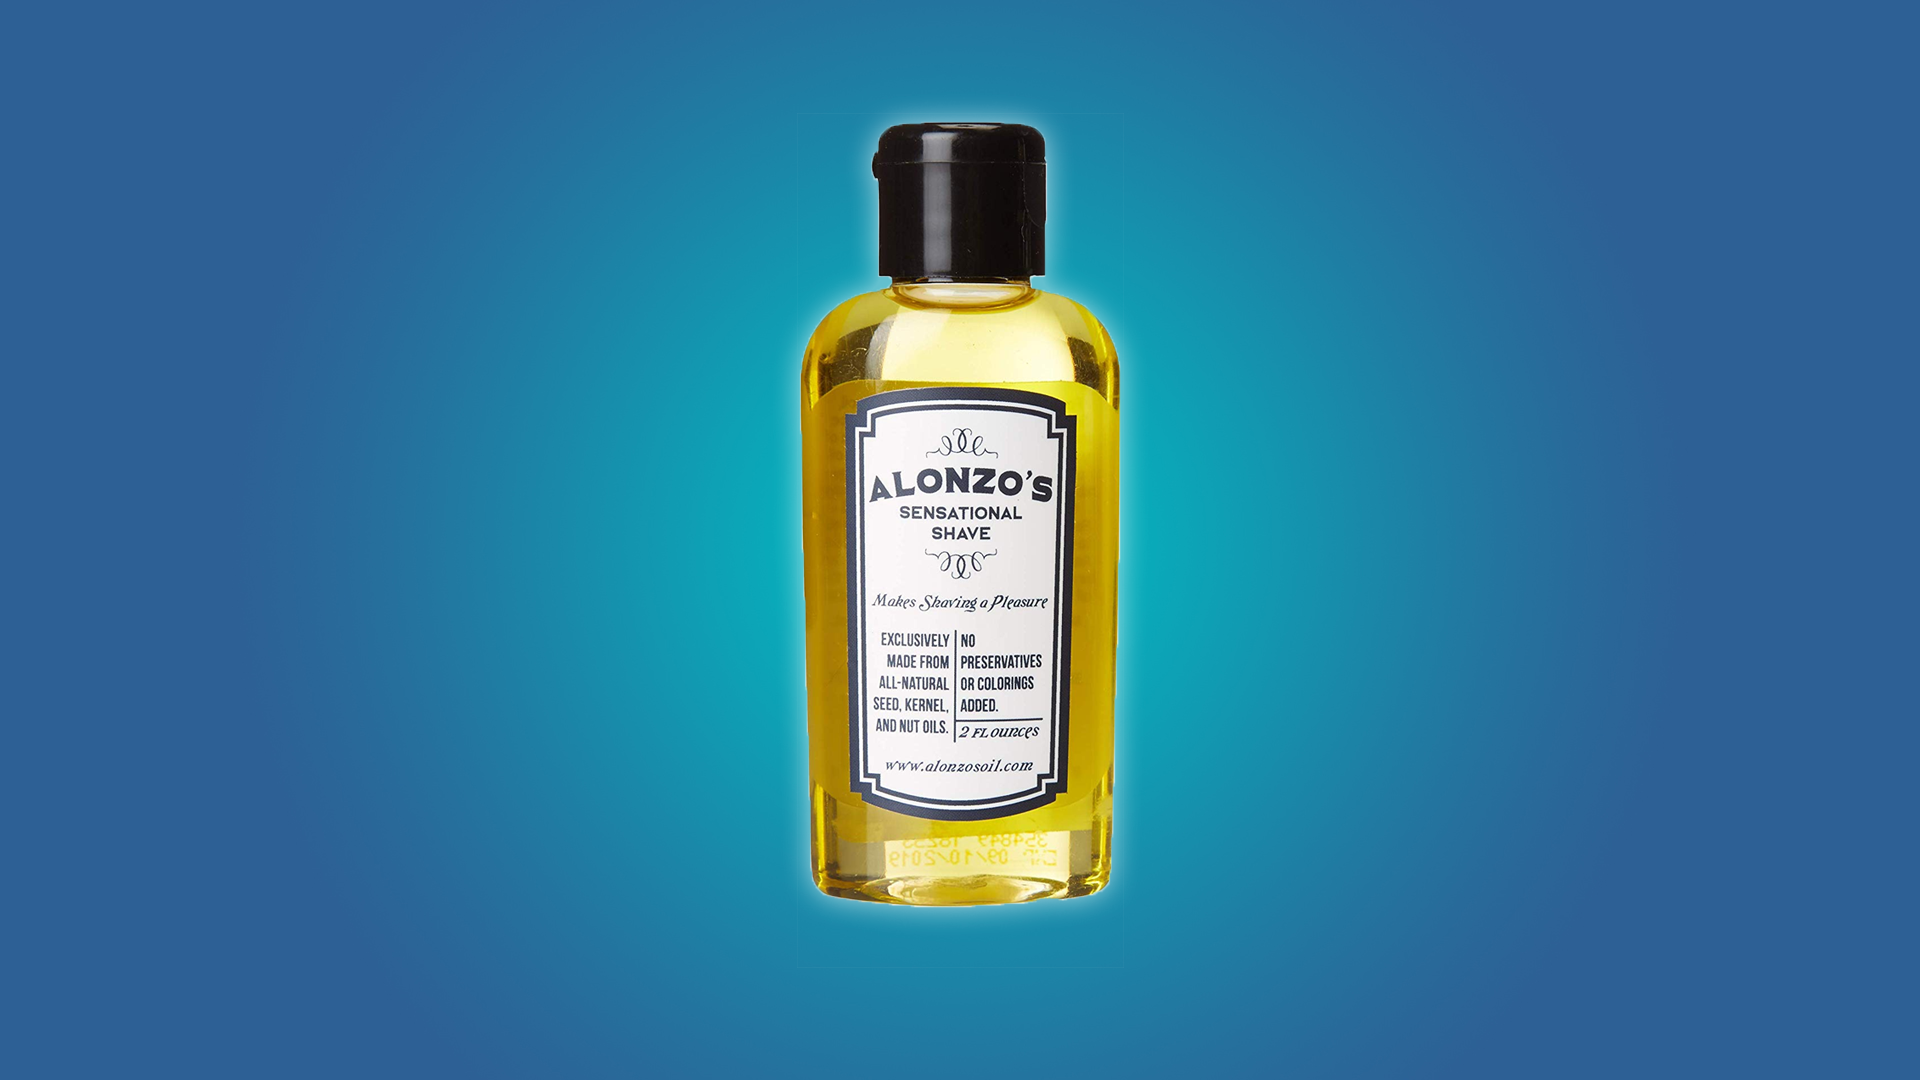 Alonzo's Sensational Shave Premium Natural 2 oz Aftershave